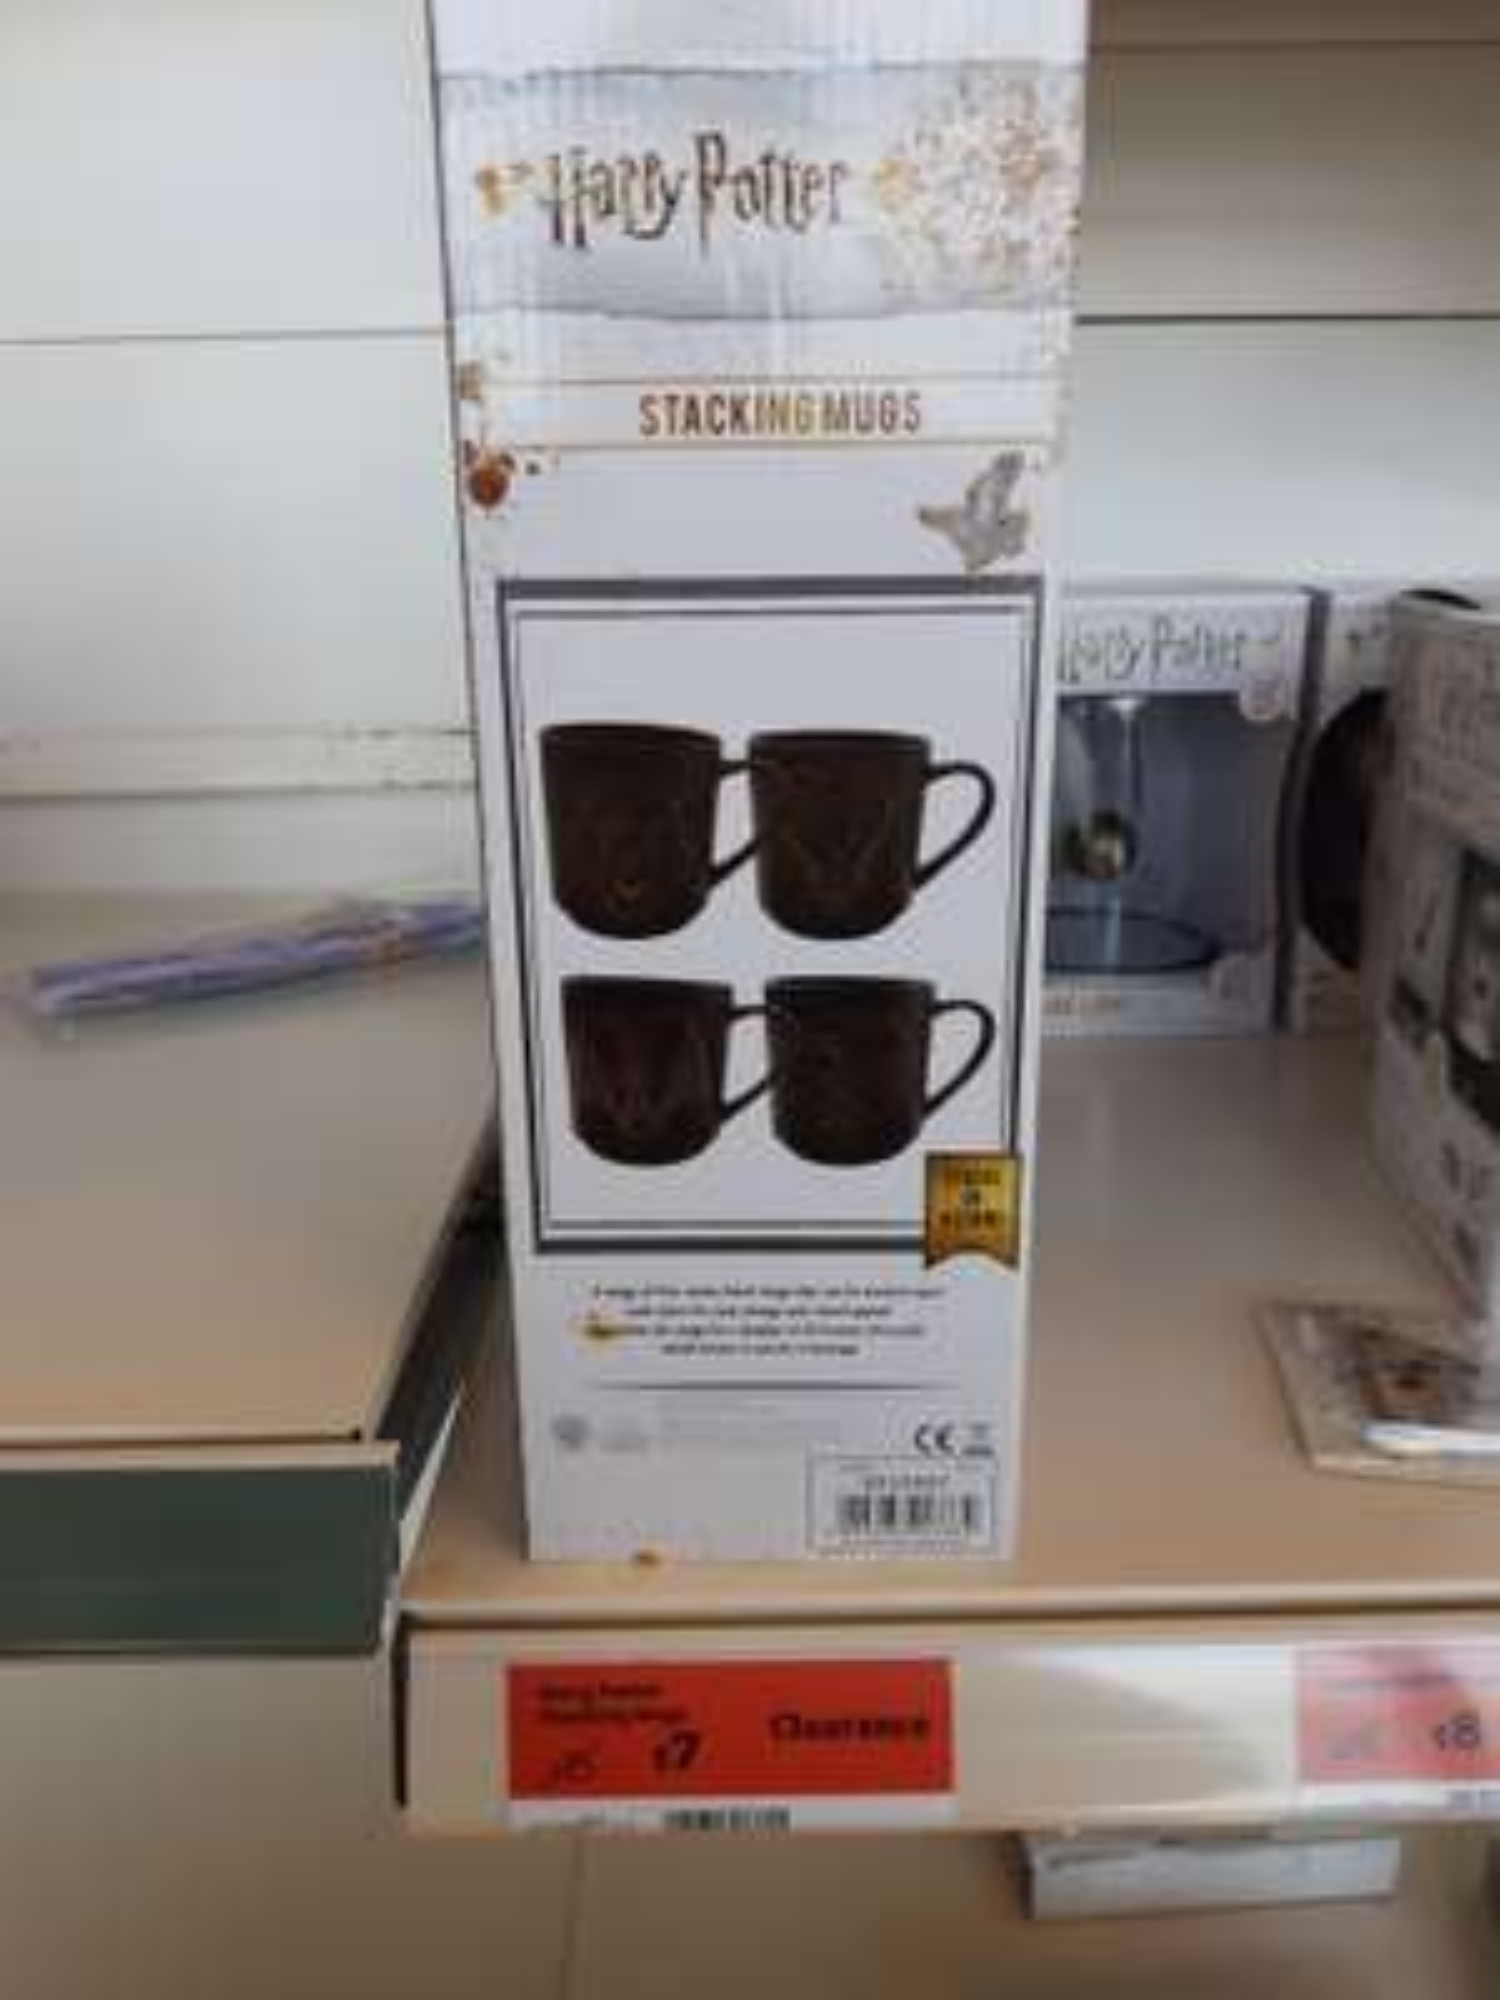 Harry potter stacking mugs - £7 Instore @ Sainsbury's (Welwyn)